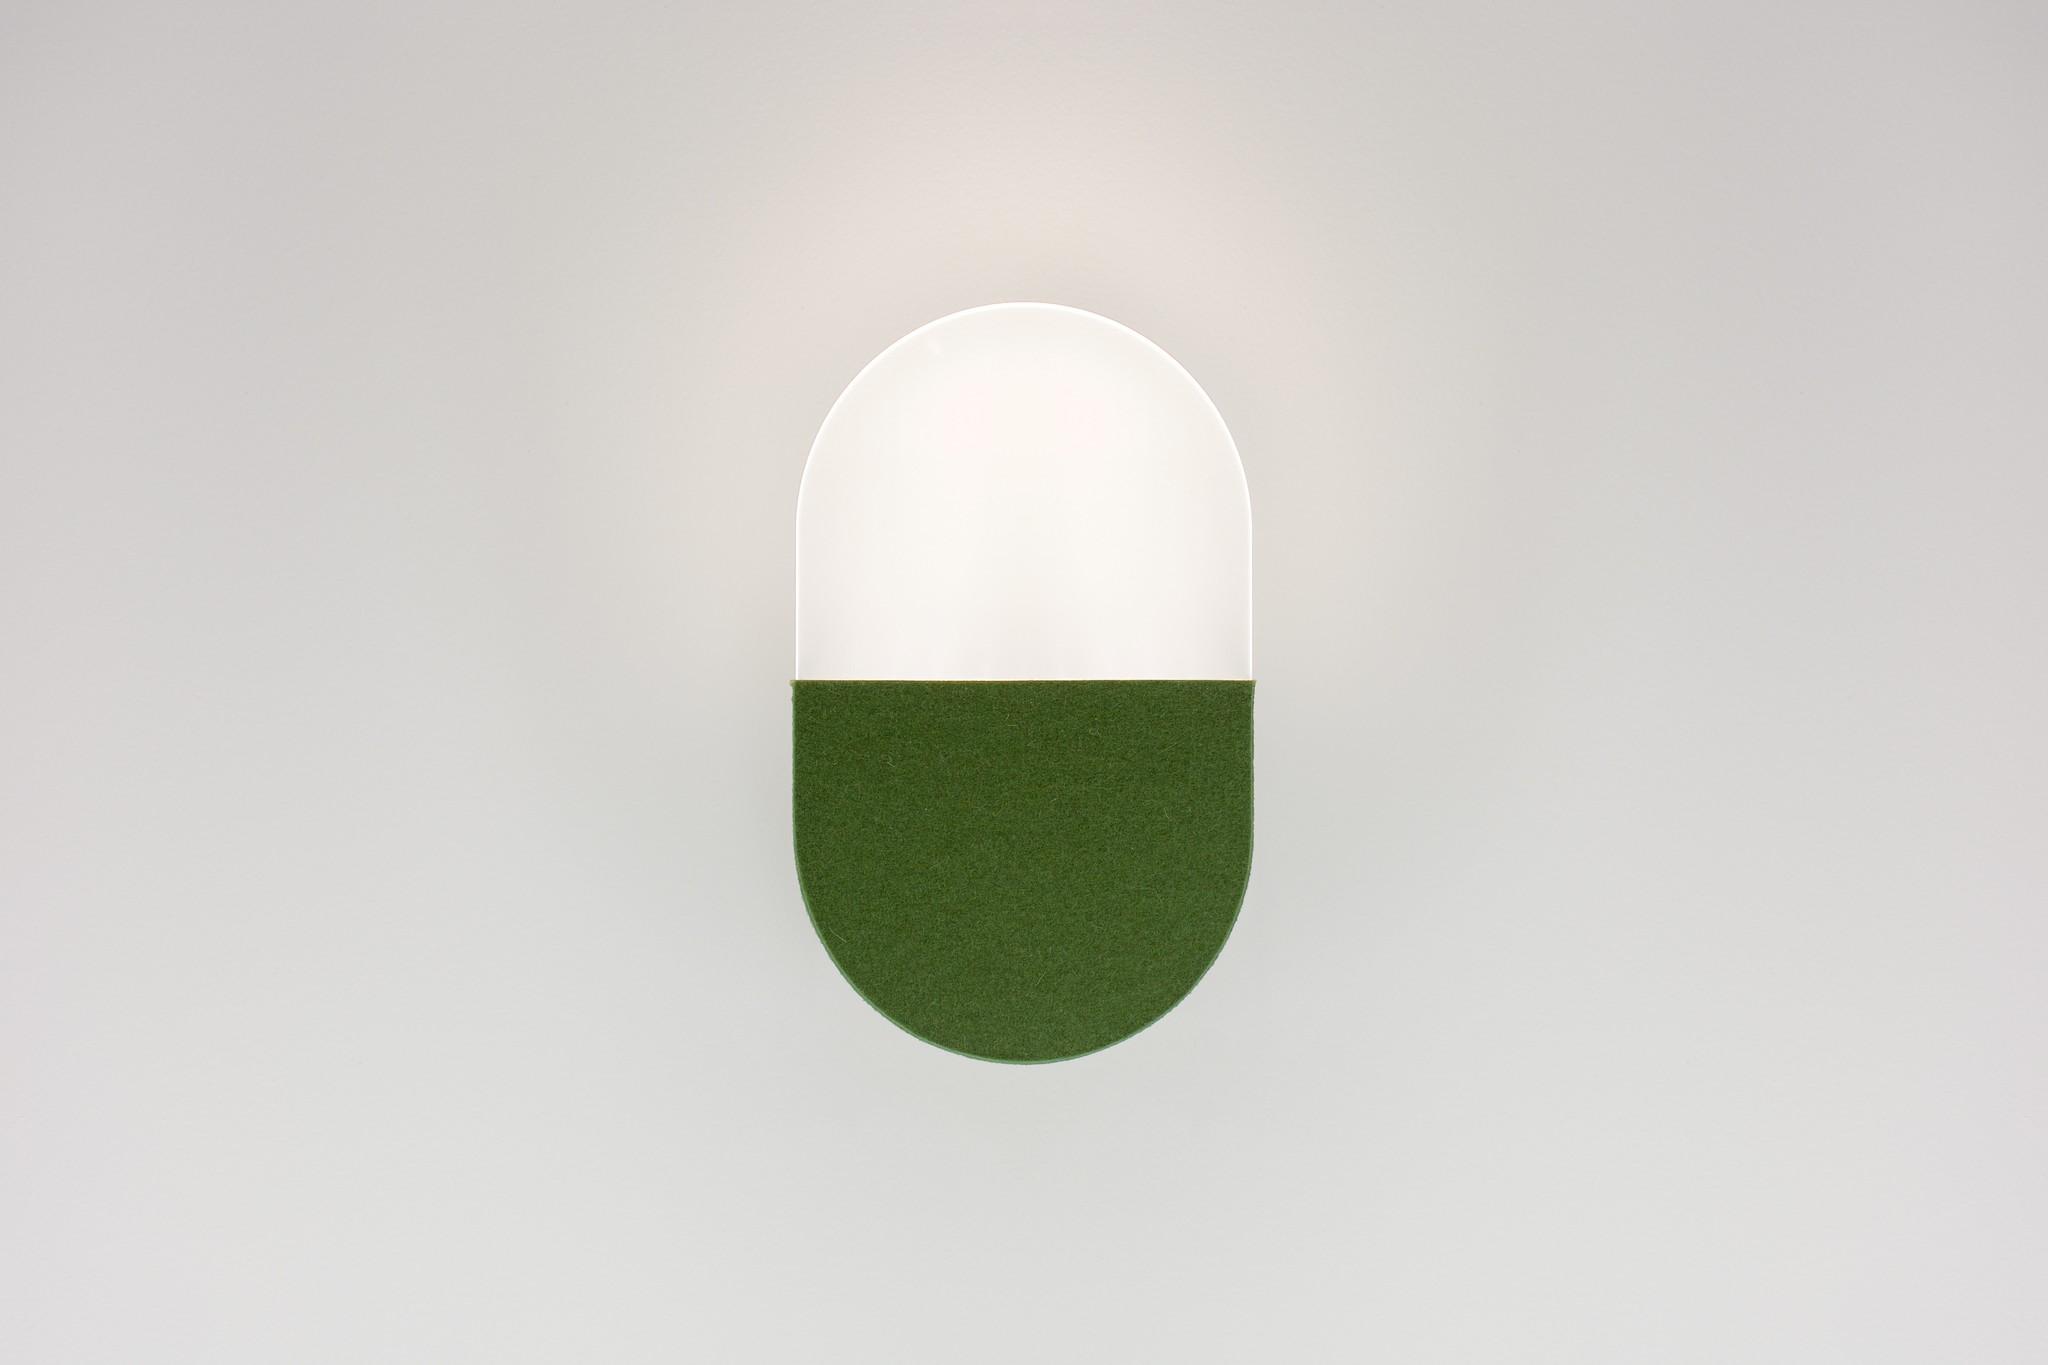 Slab wall green